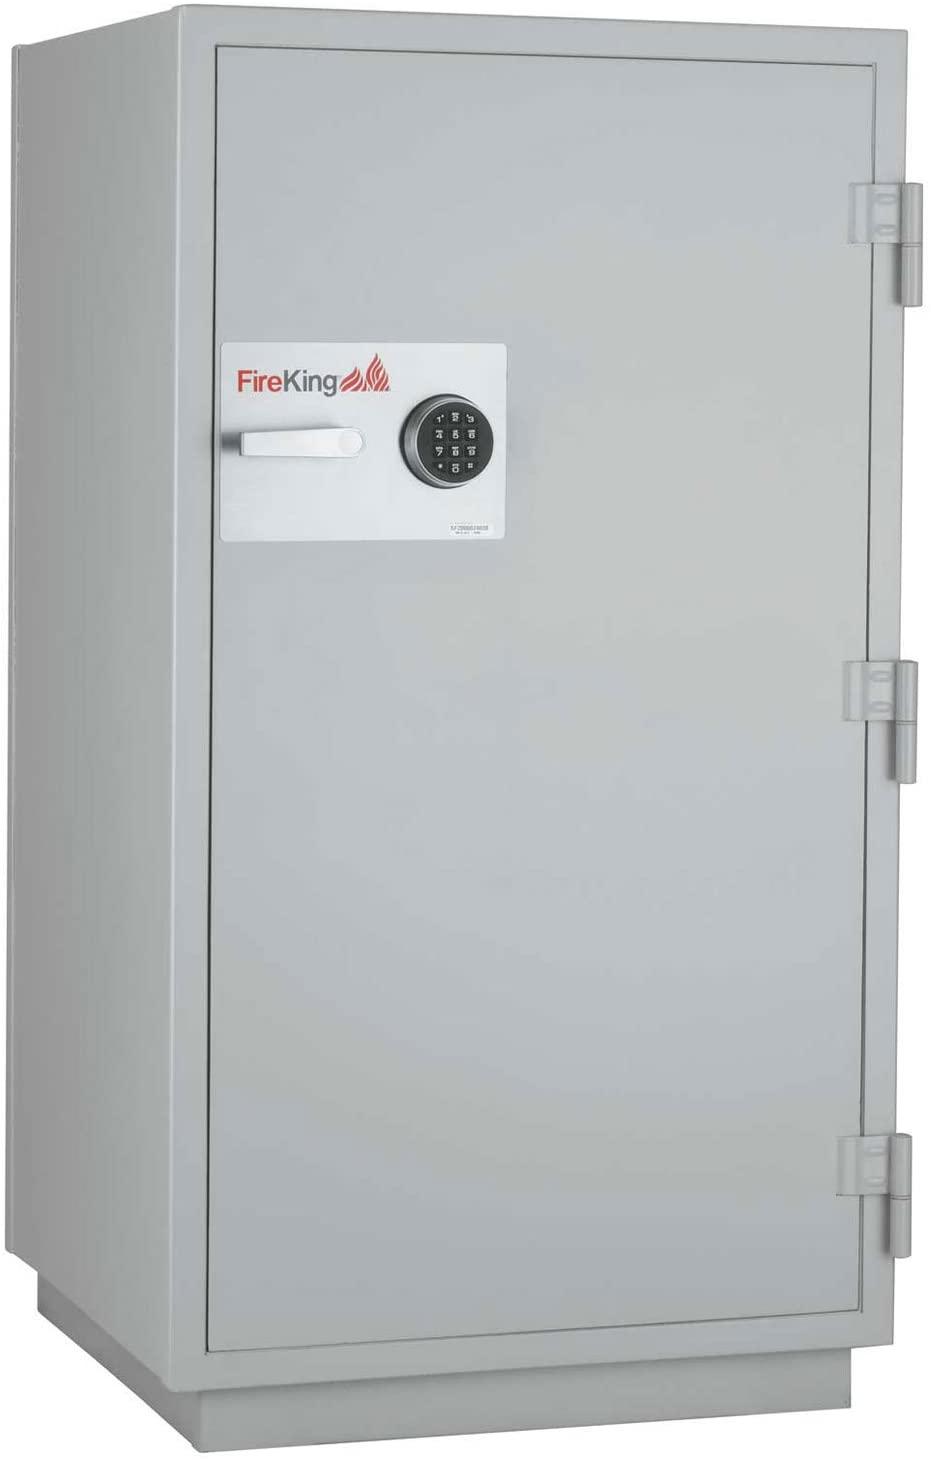 Fireking Data Safe Dm4420-3, 3-Hour Fire/Impact Rating 32-1/16 X 31 X 59-3/4 Platinum Finish